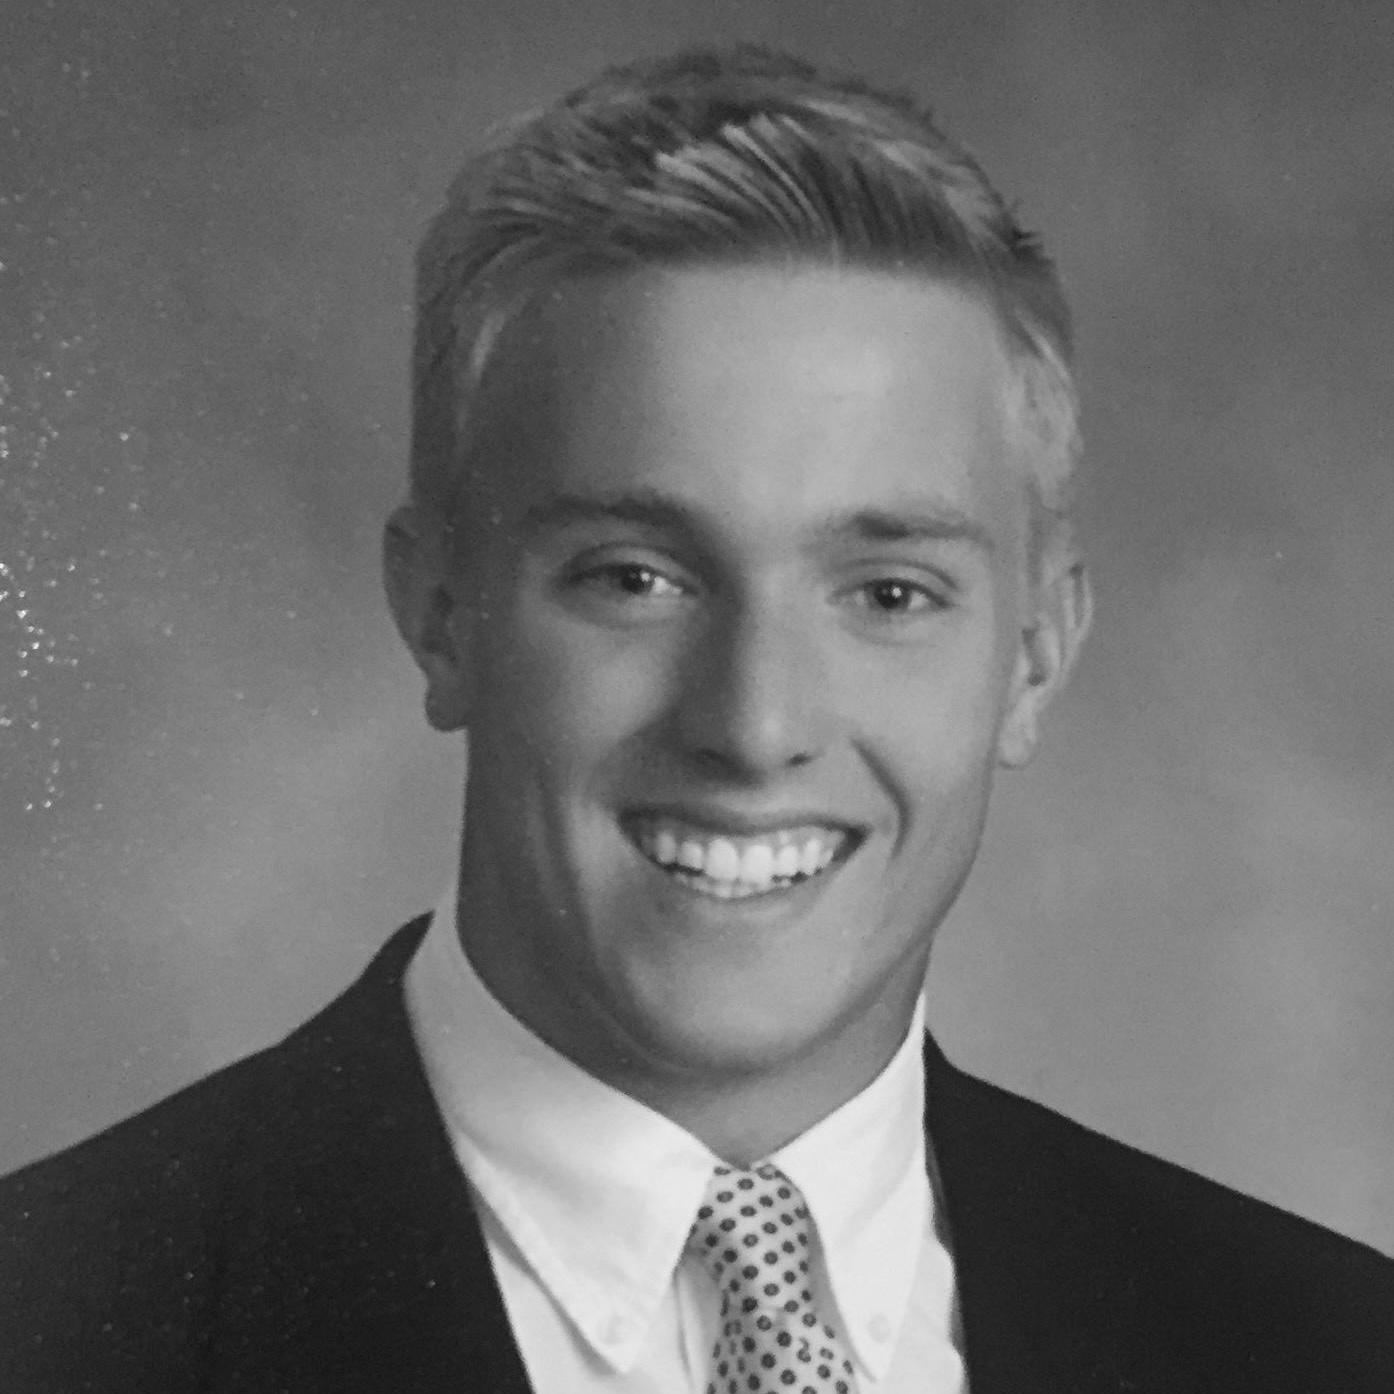 Patrick Ryan - MIT 2021 | Computer Science major